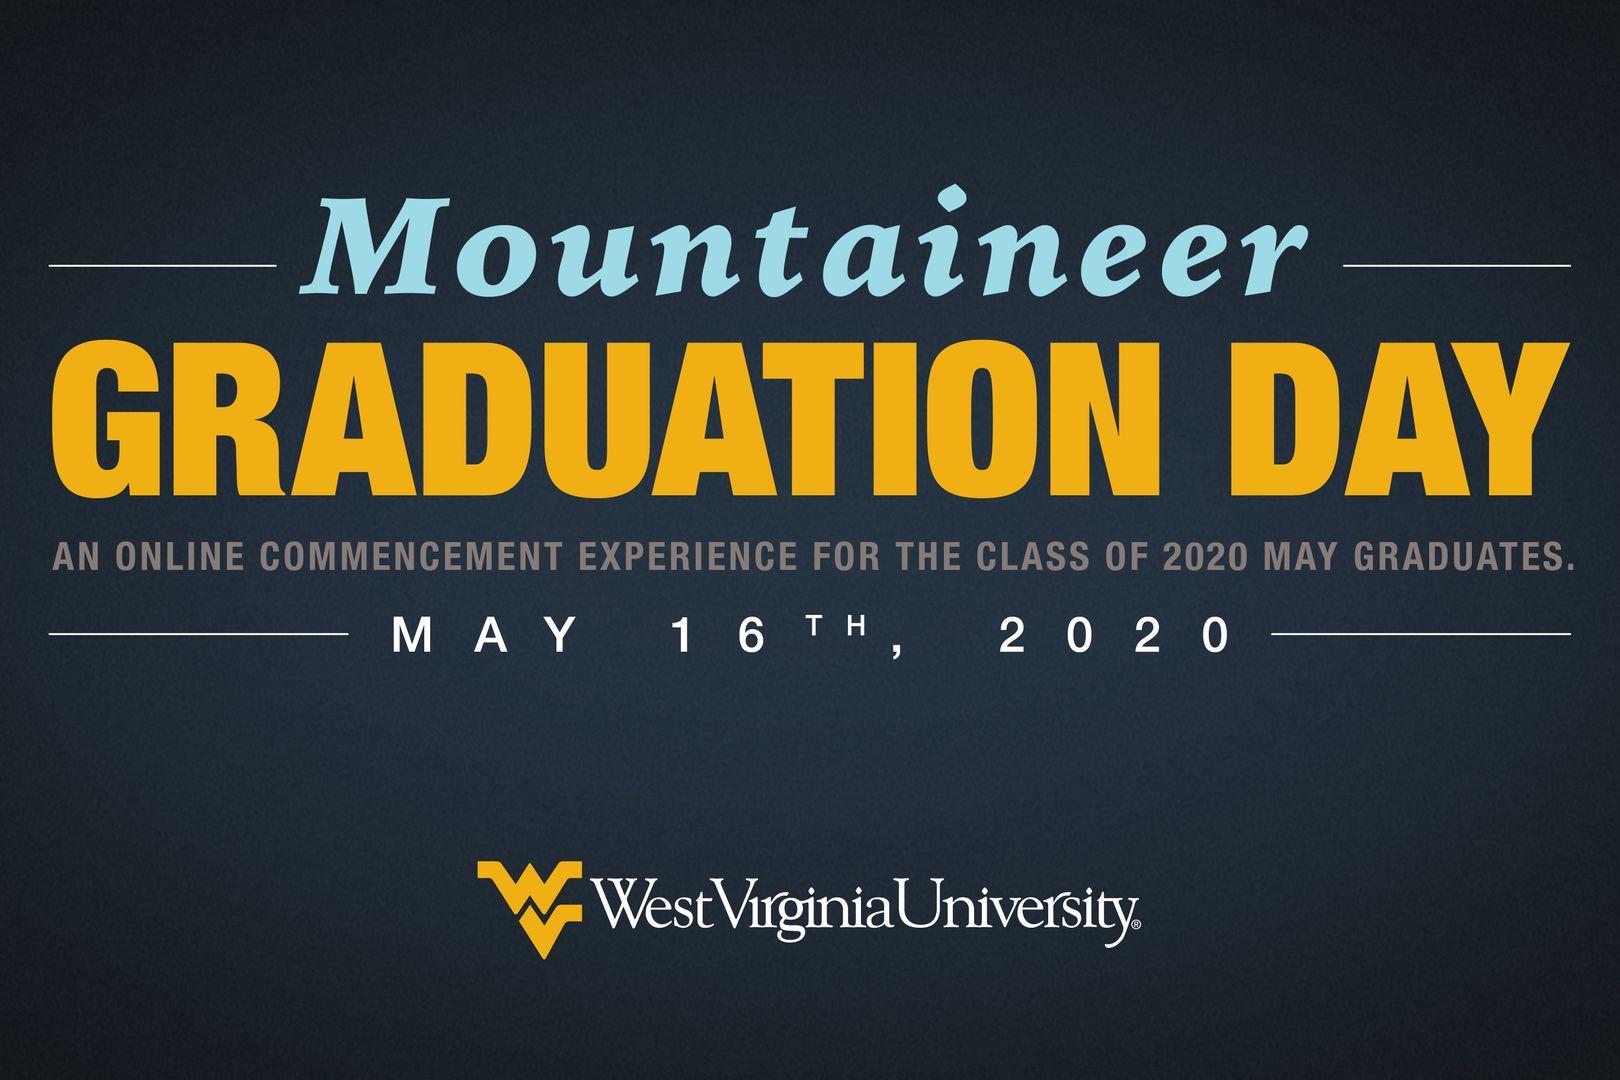 Mountaineer Graduation Day graphic